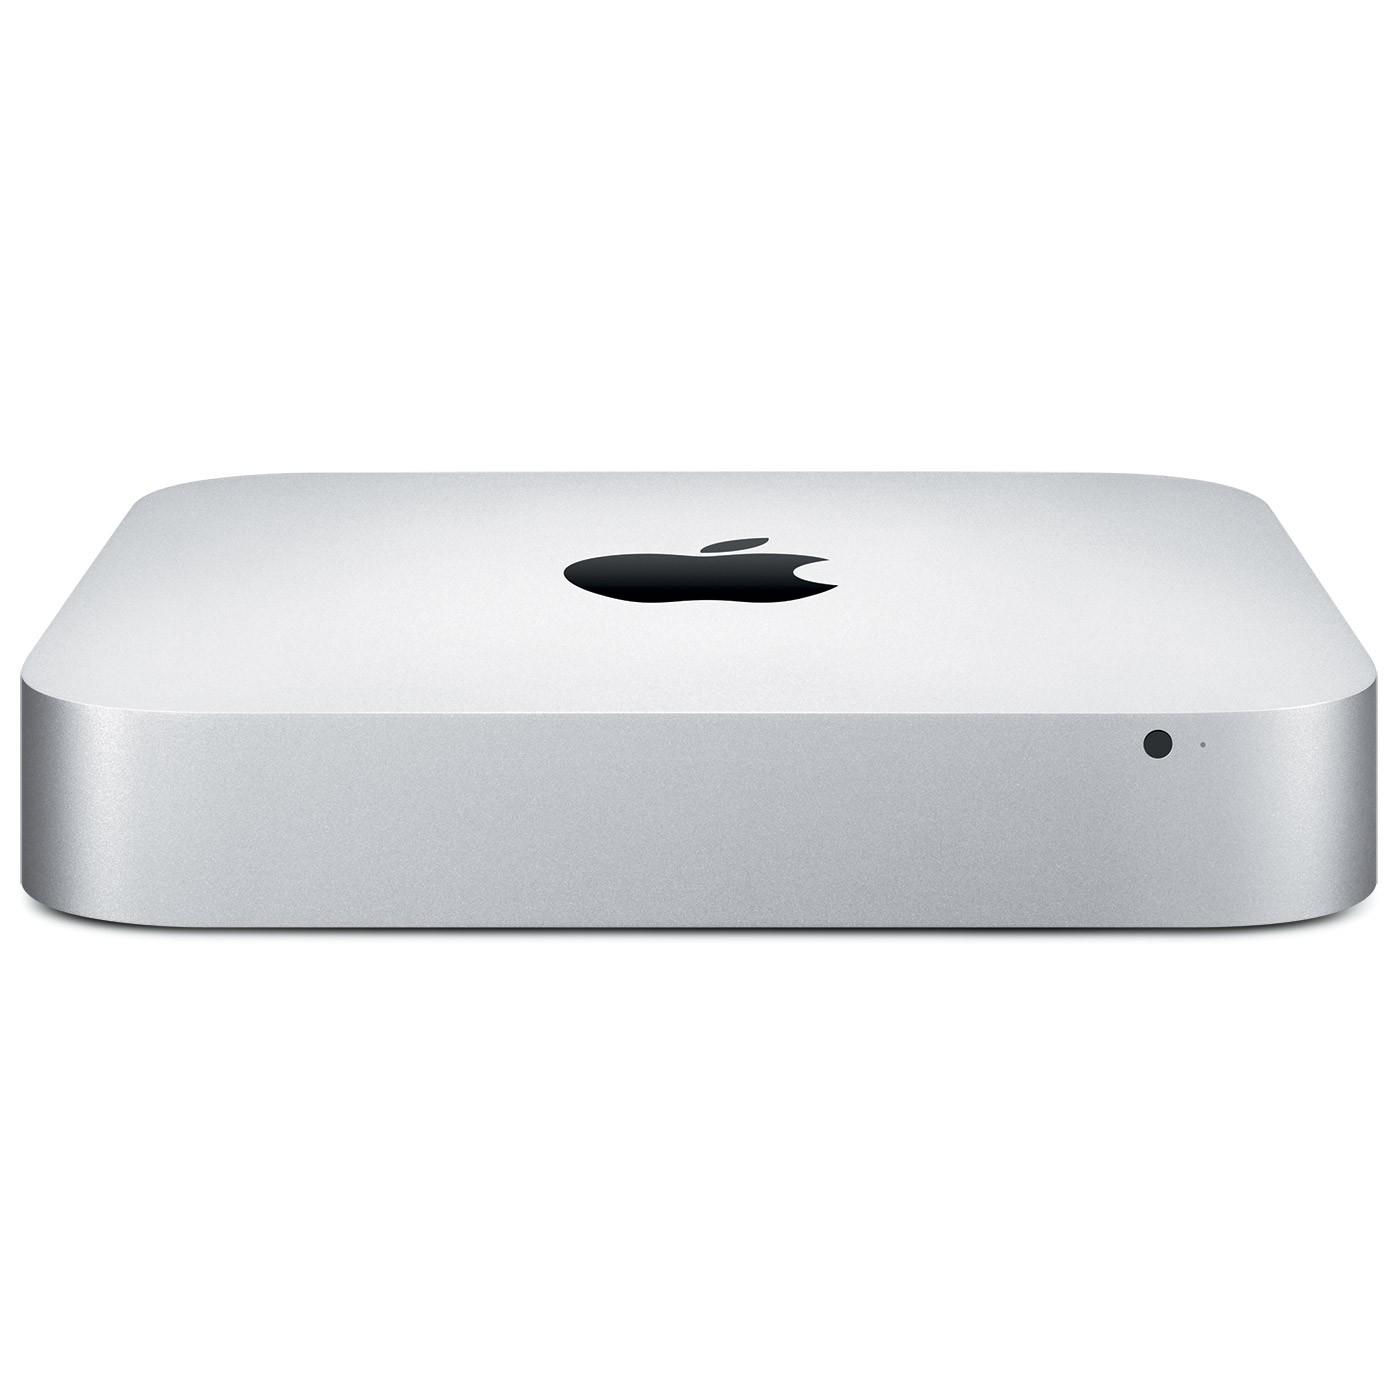 Mac Mini Core i5 2,6 Ghz,8 Go RAM,1 To HDD (1 an de Garantie)